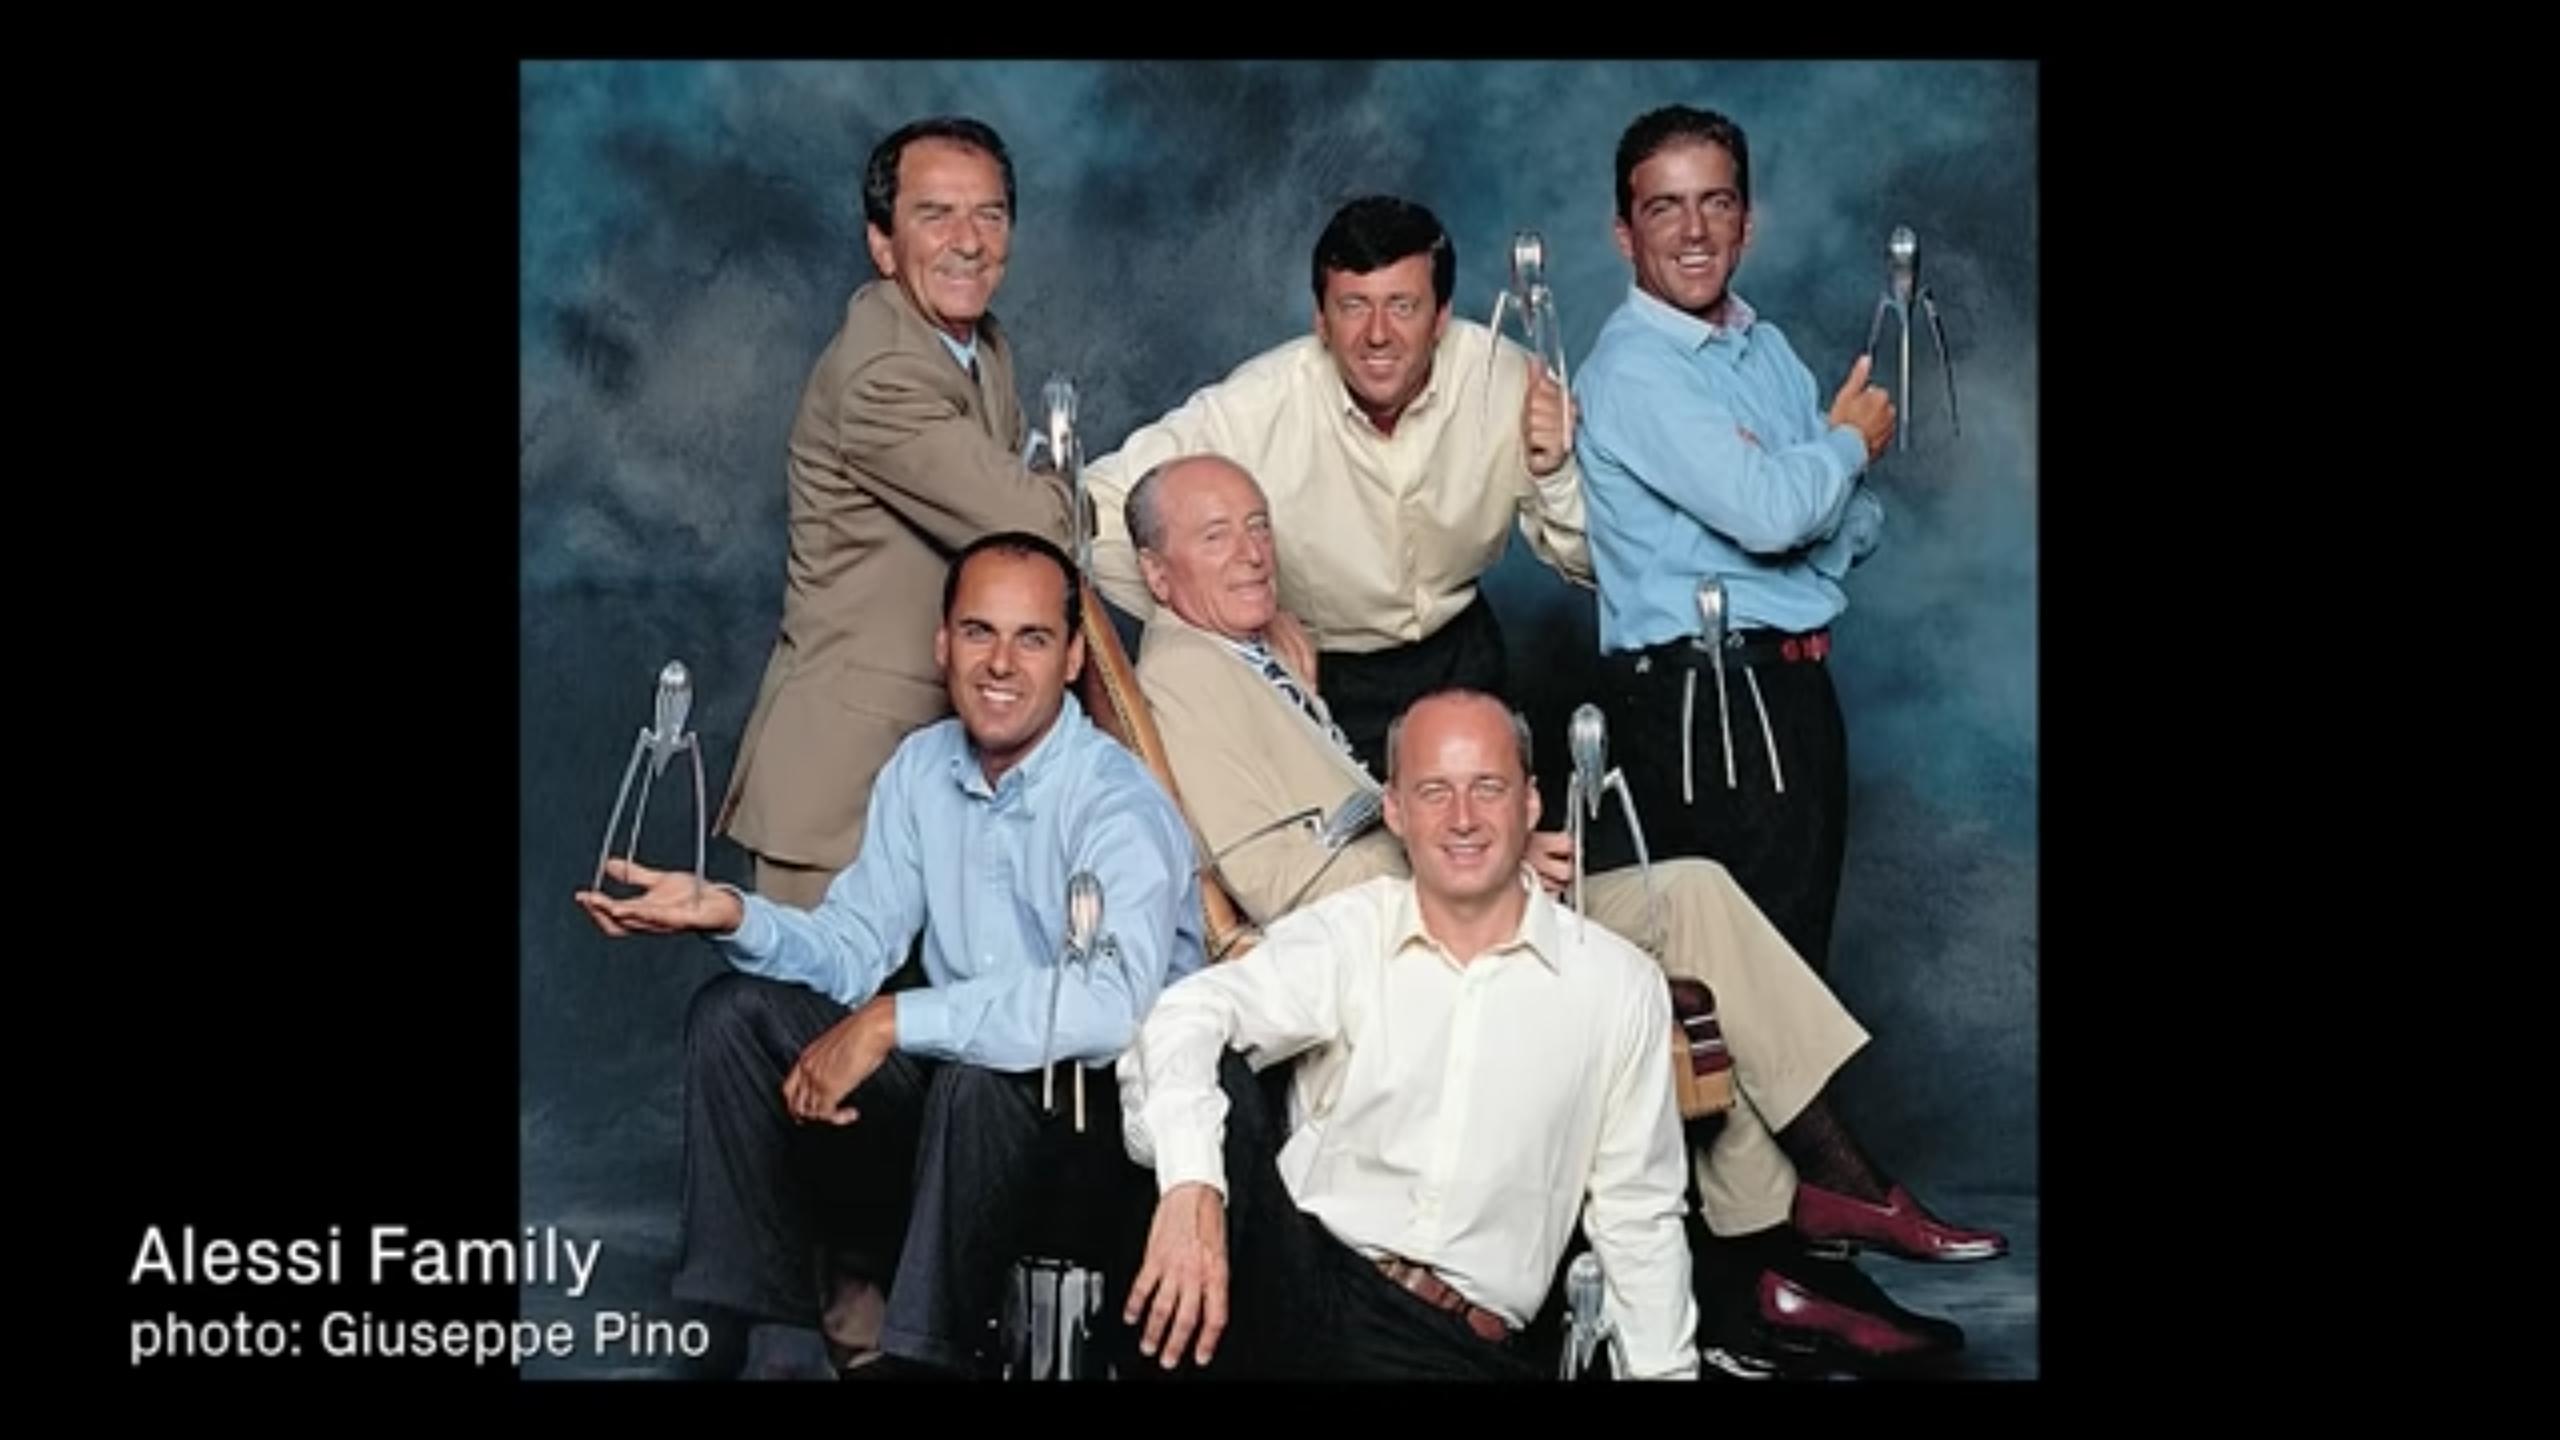 group of men smiling holding sculptures